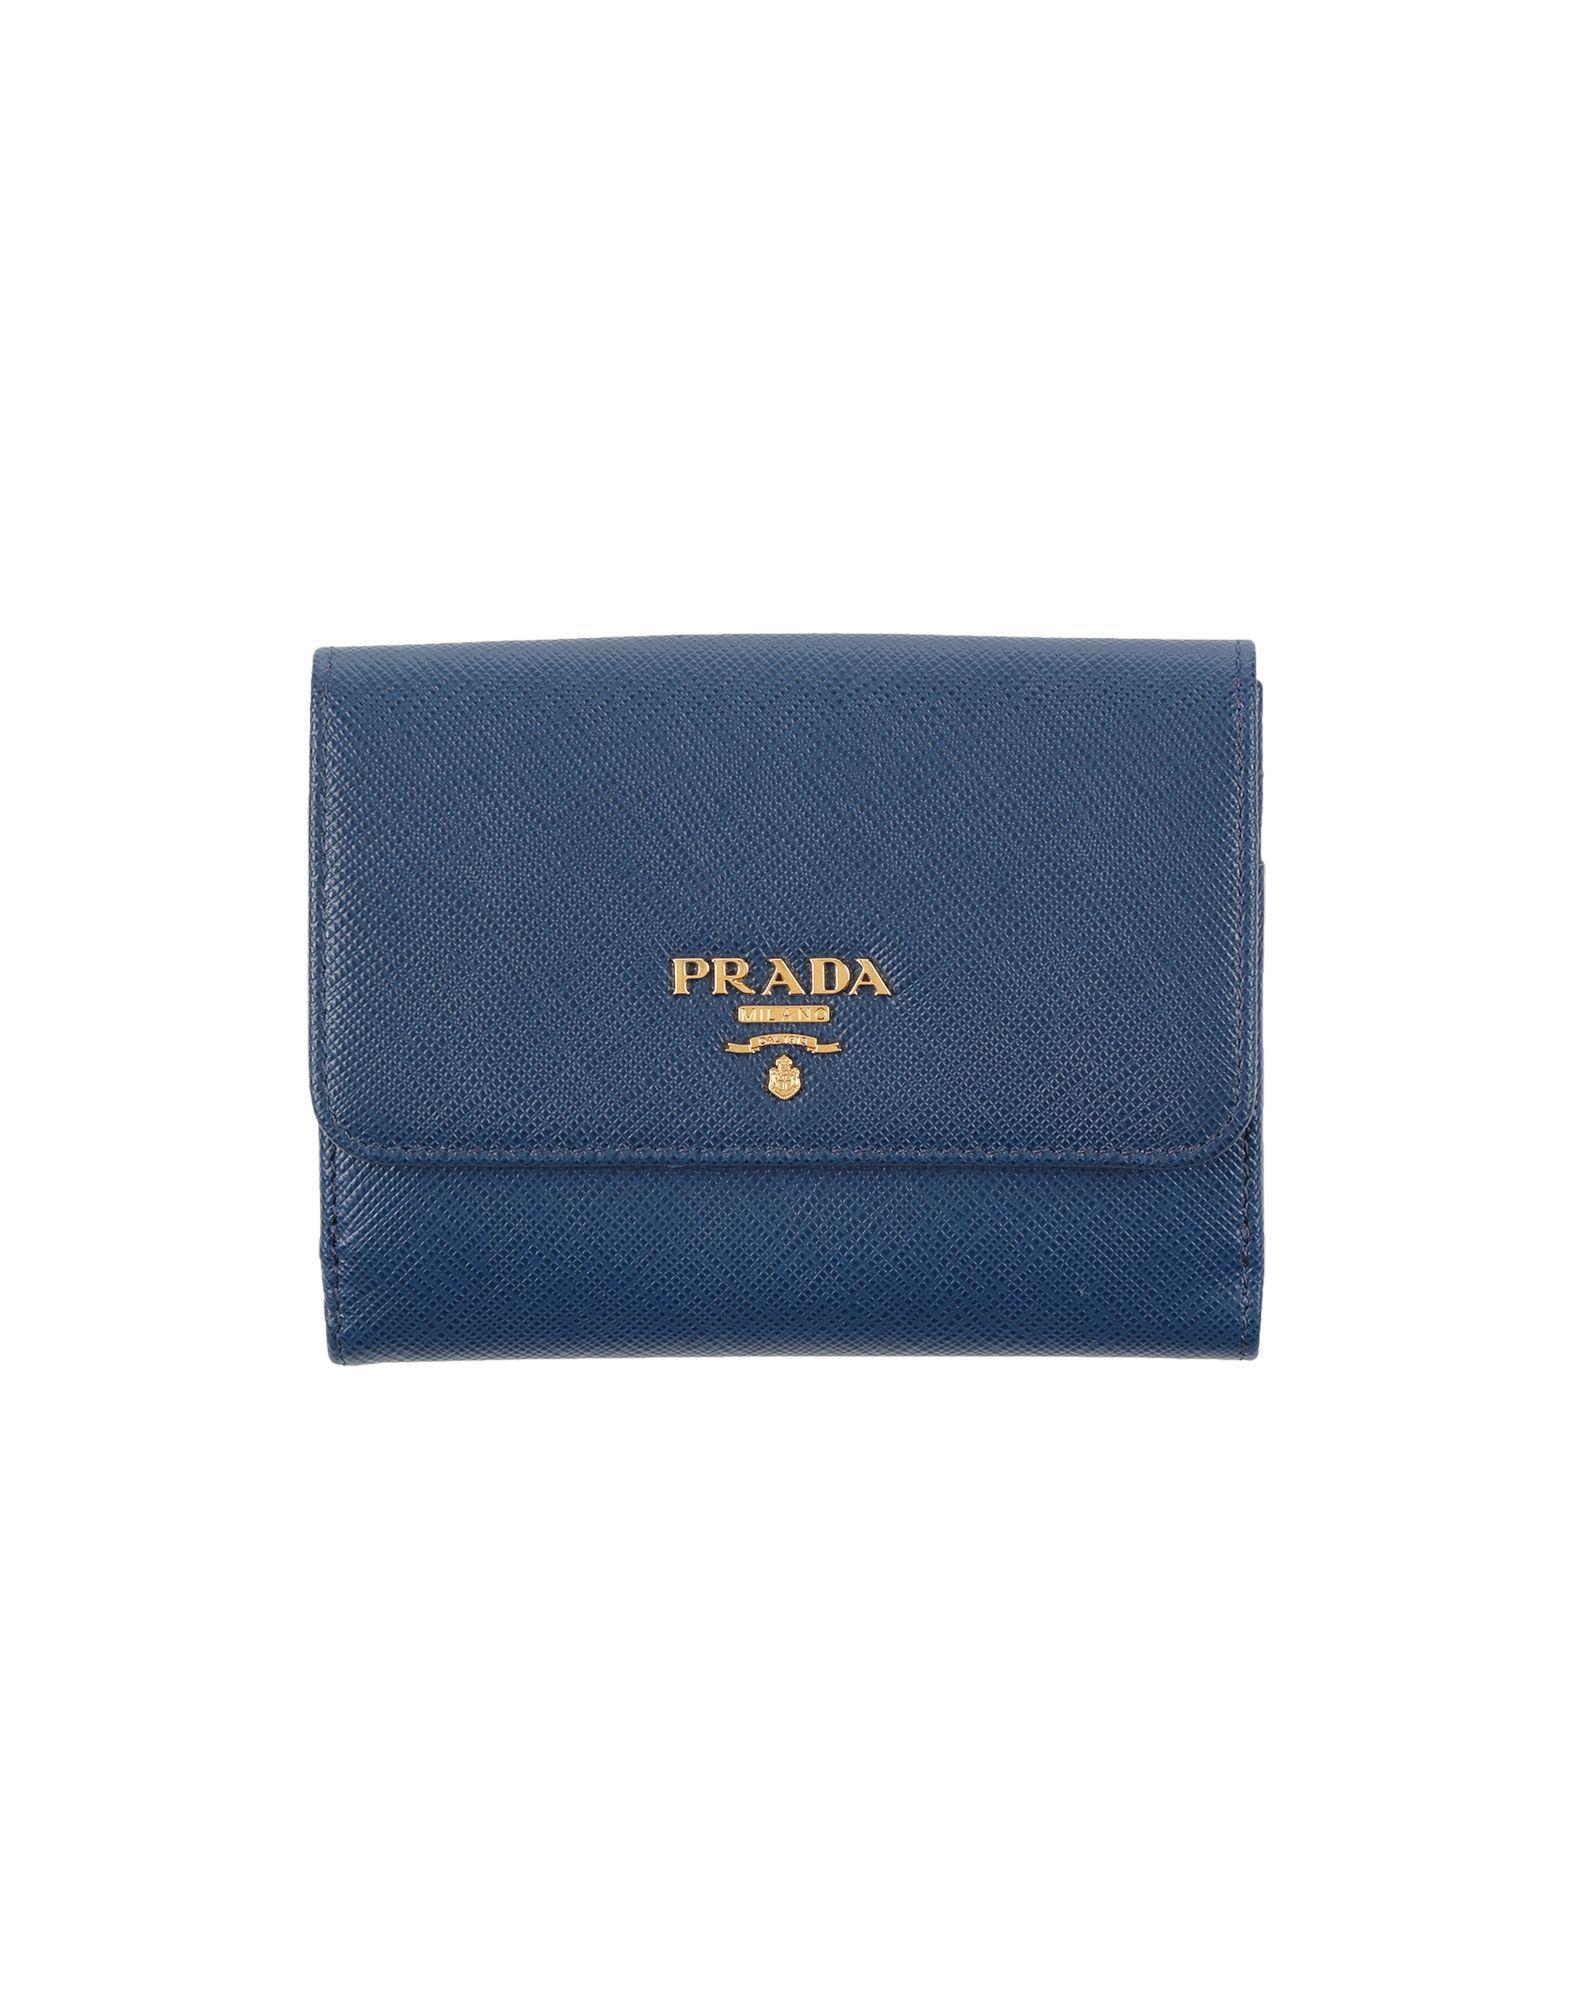 26e8ff4afa3110 ... cheap prada blue wallets for men lyst. view fullscreen 0587d 45331